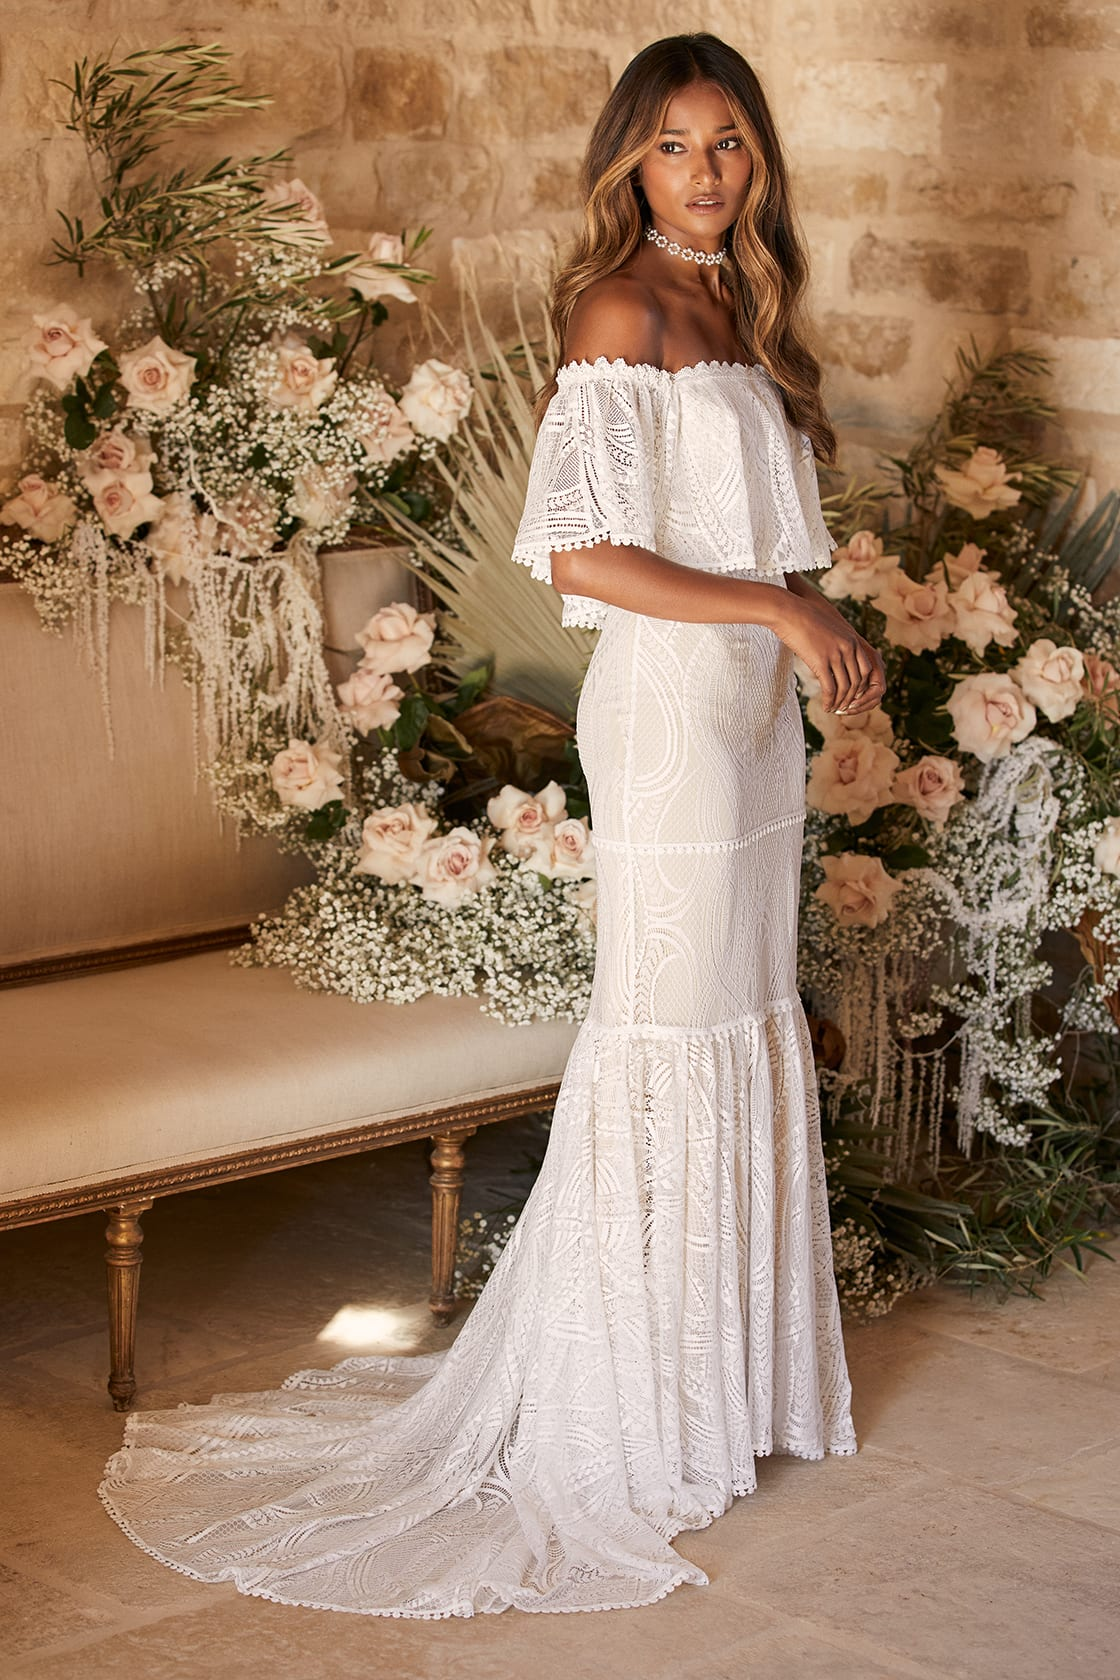 Affordable bohemian lace wedding dress